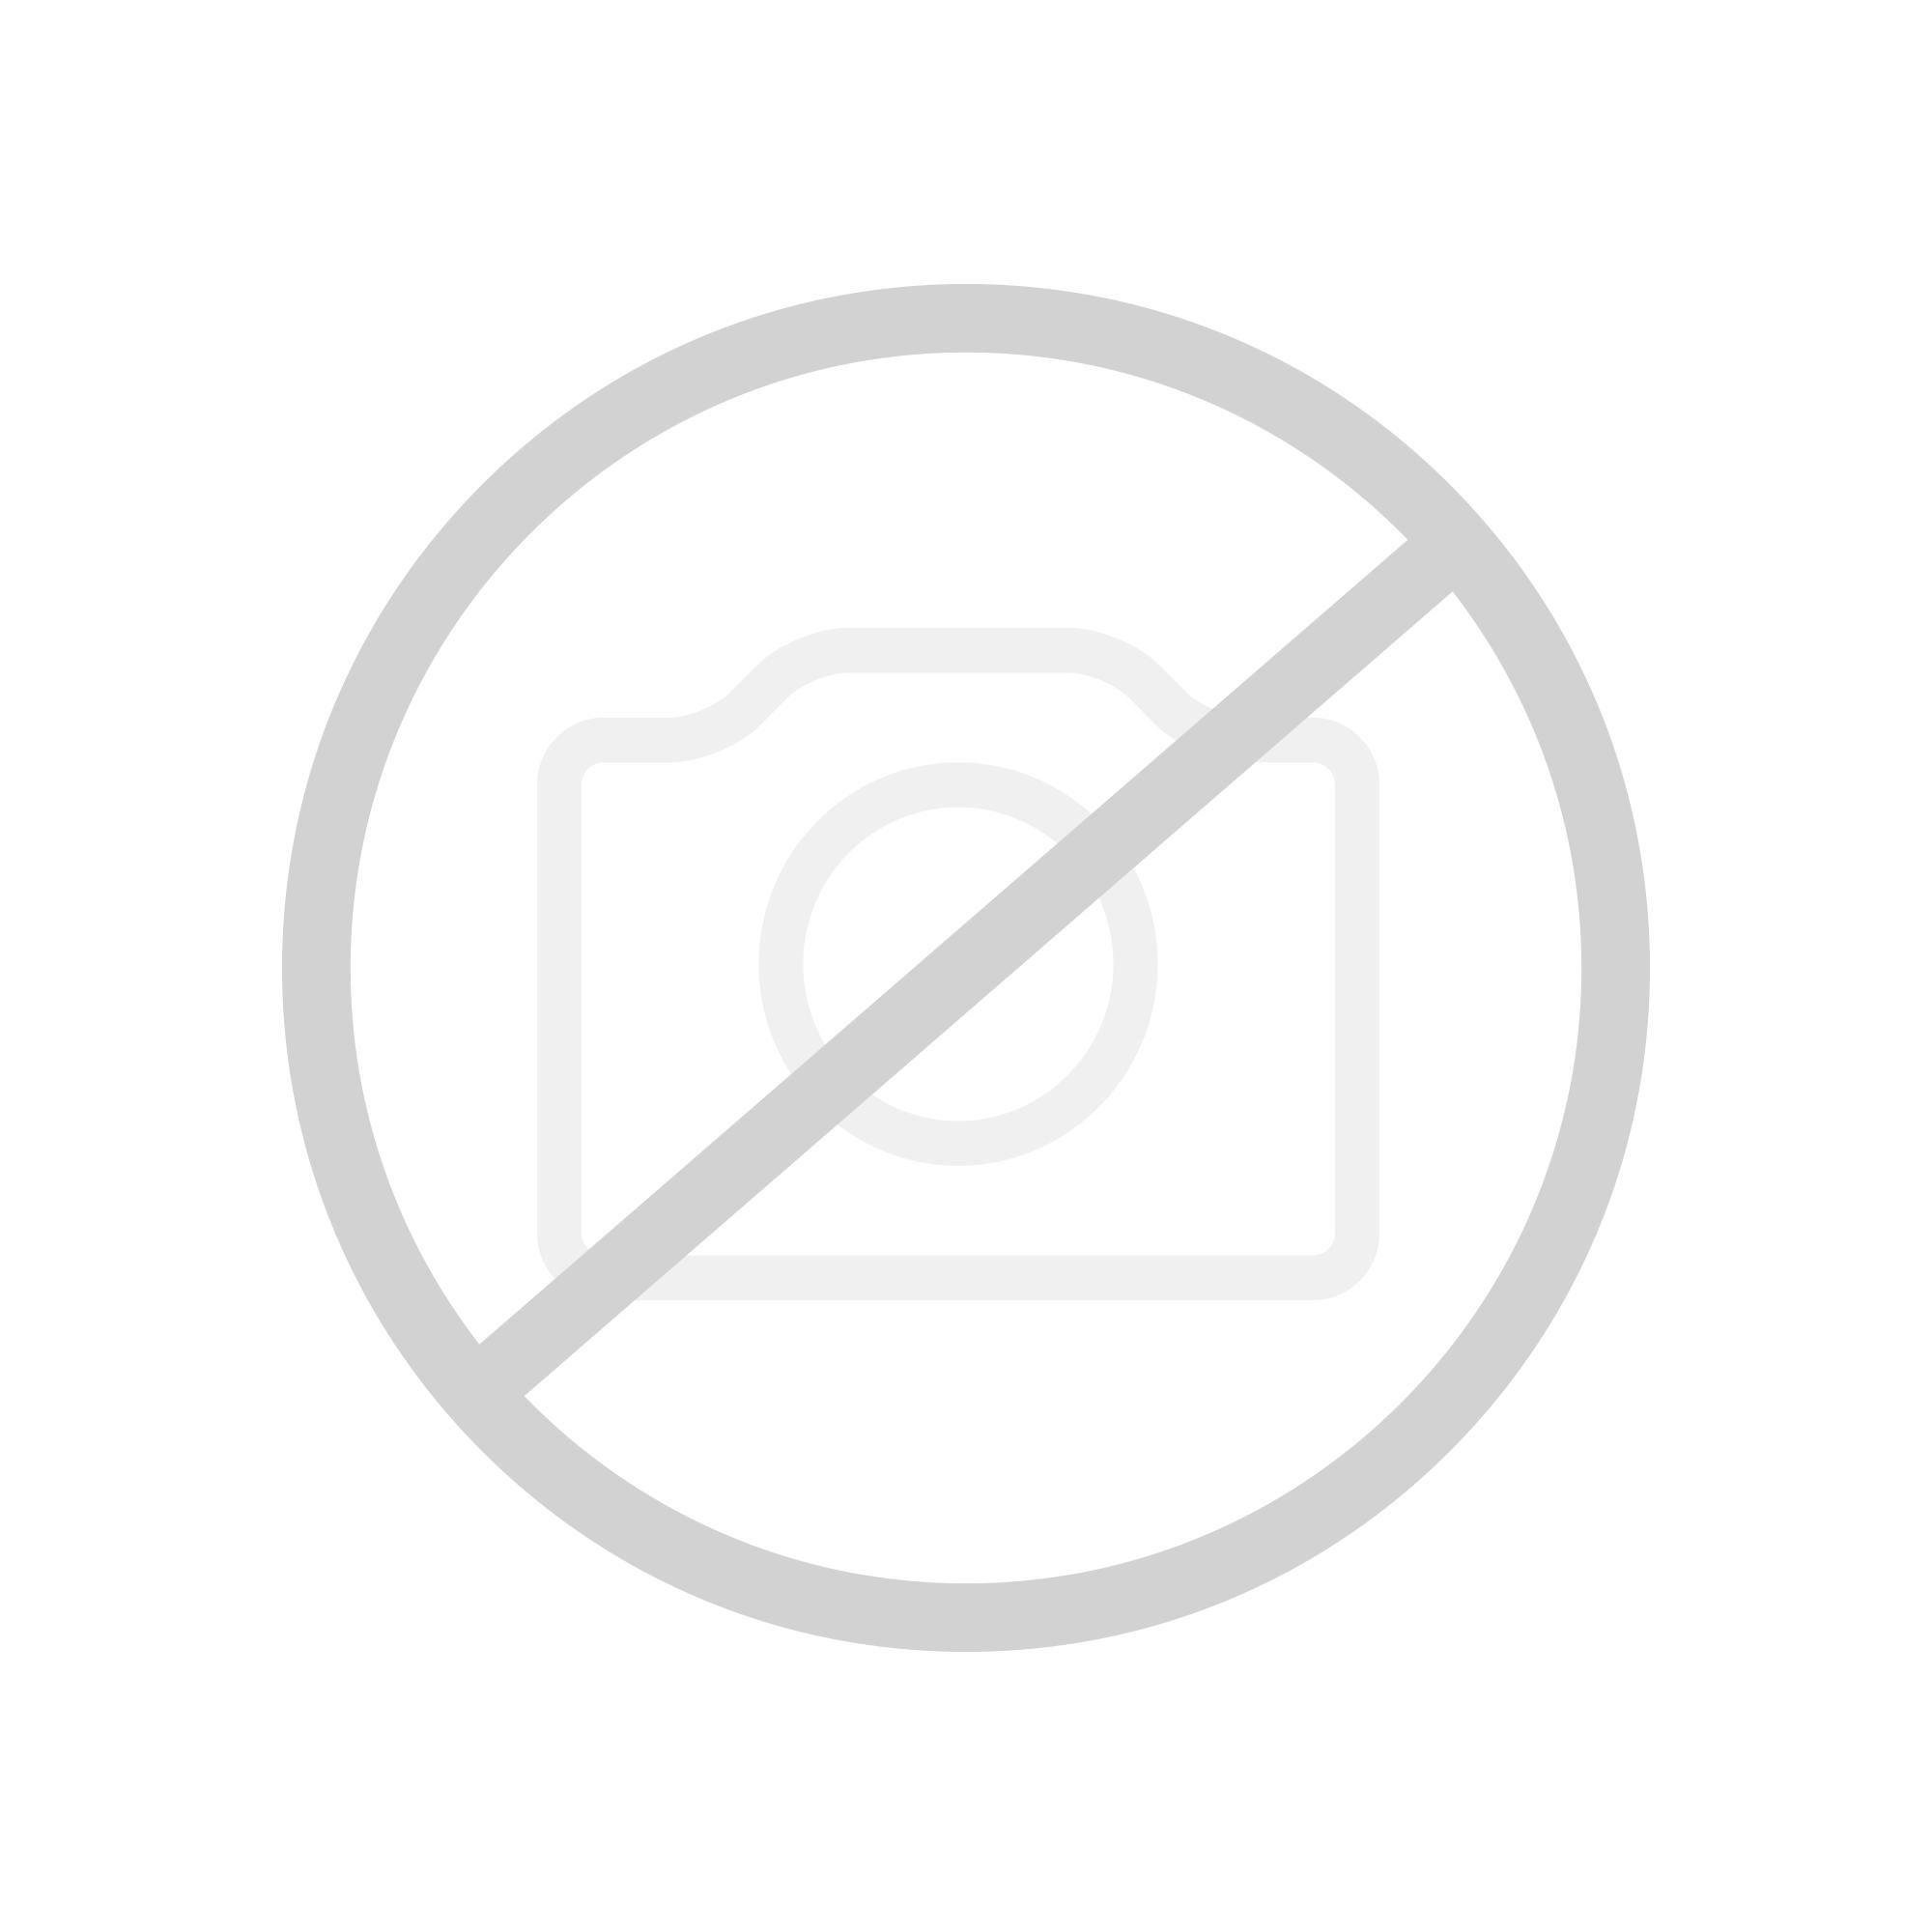 Duschwanne flach  Duschwannen & Duschtassen günstig kaufen bei REUTER